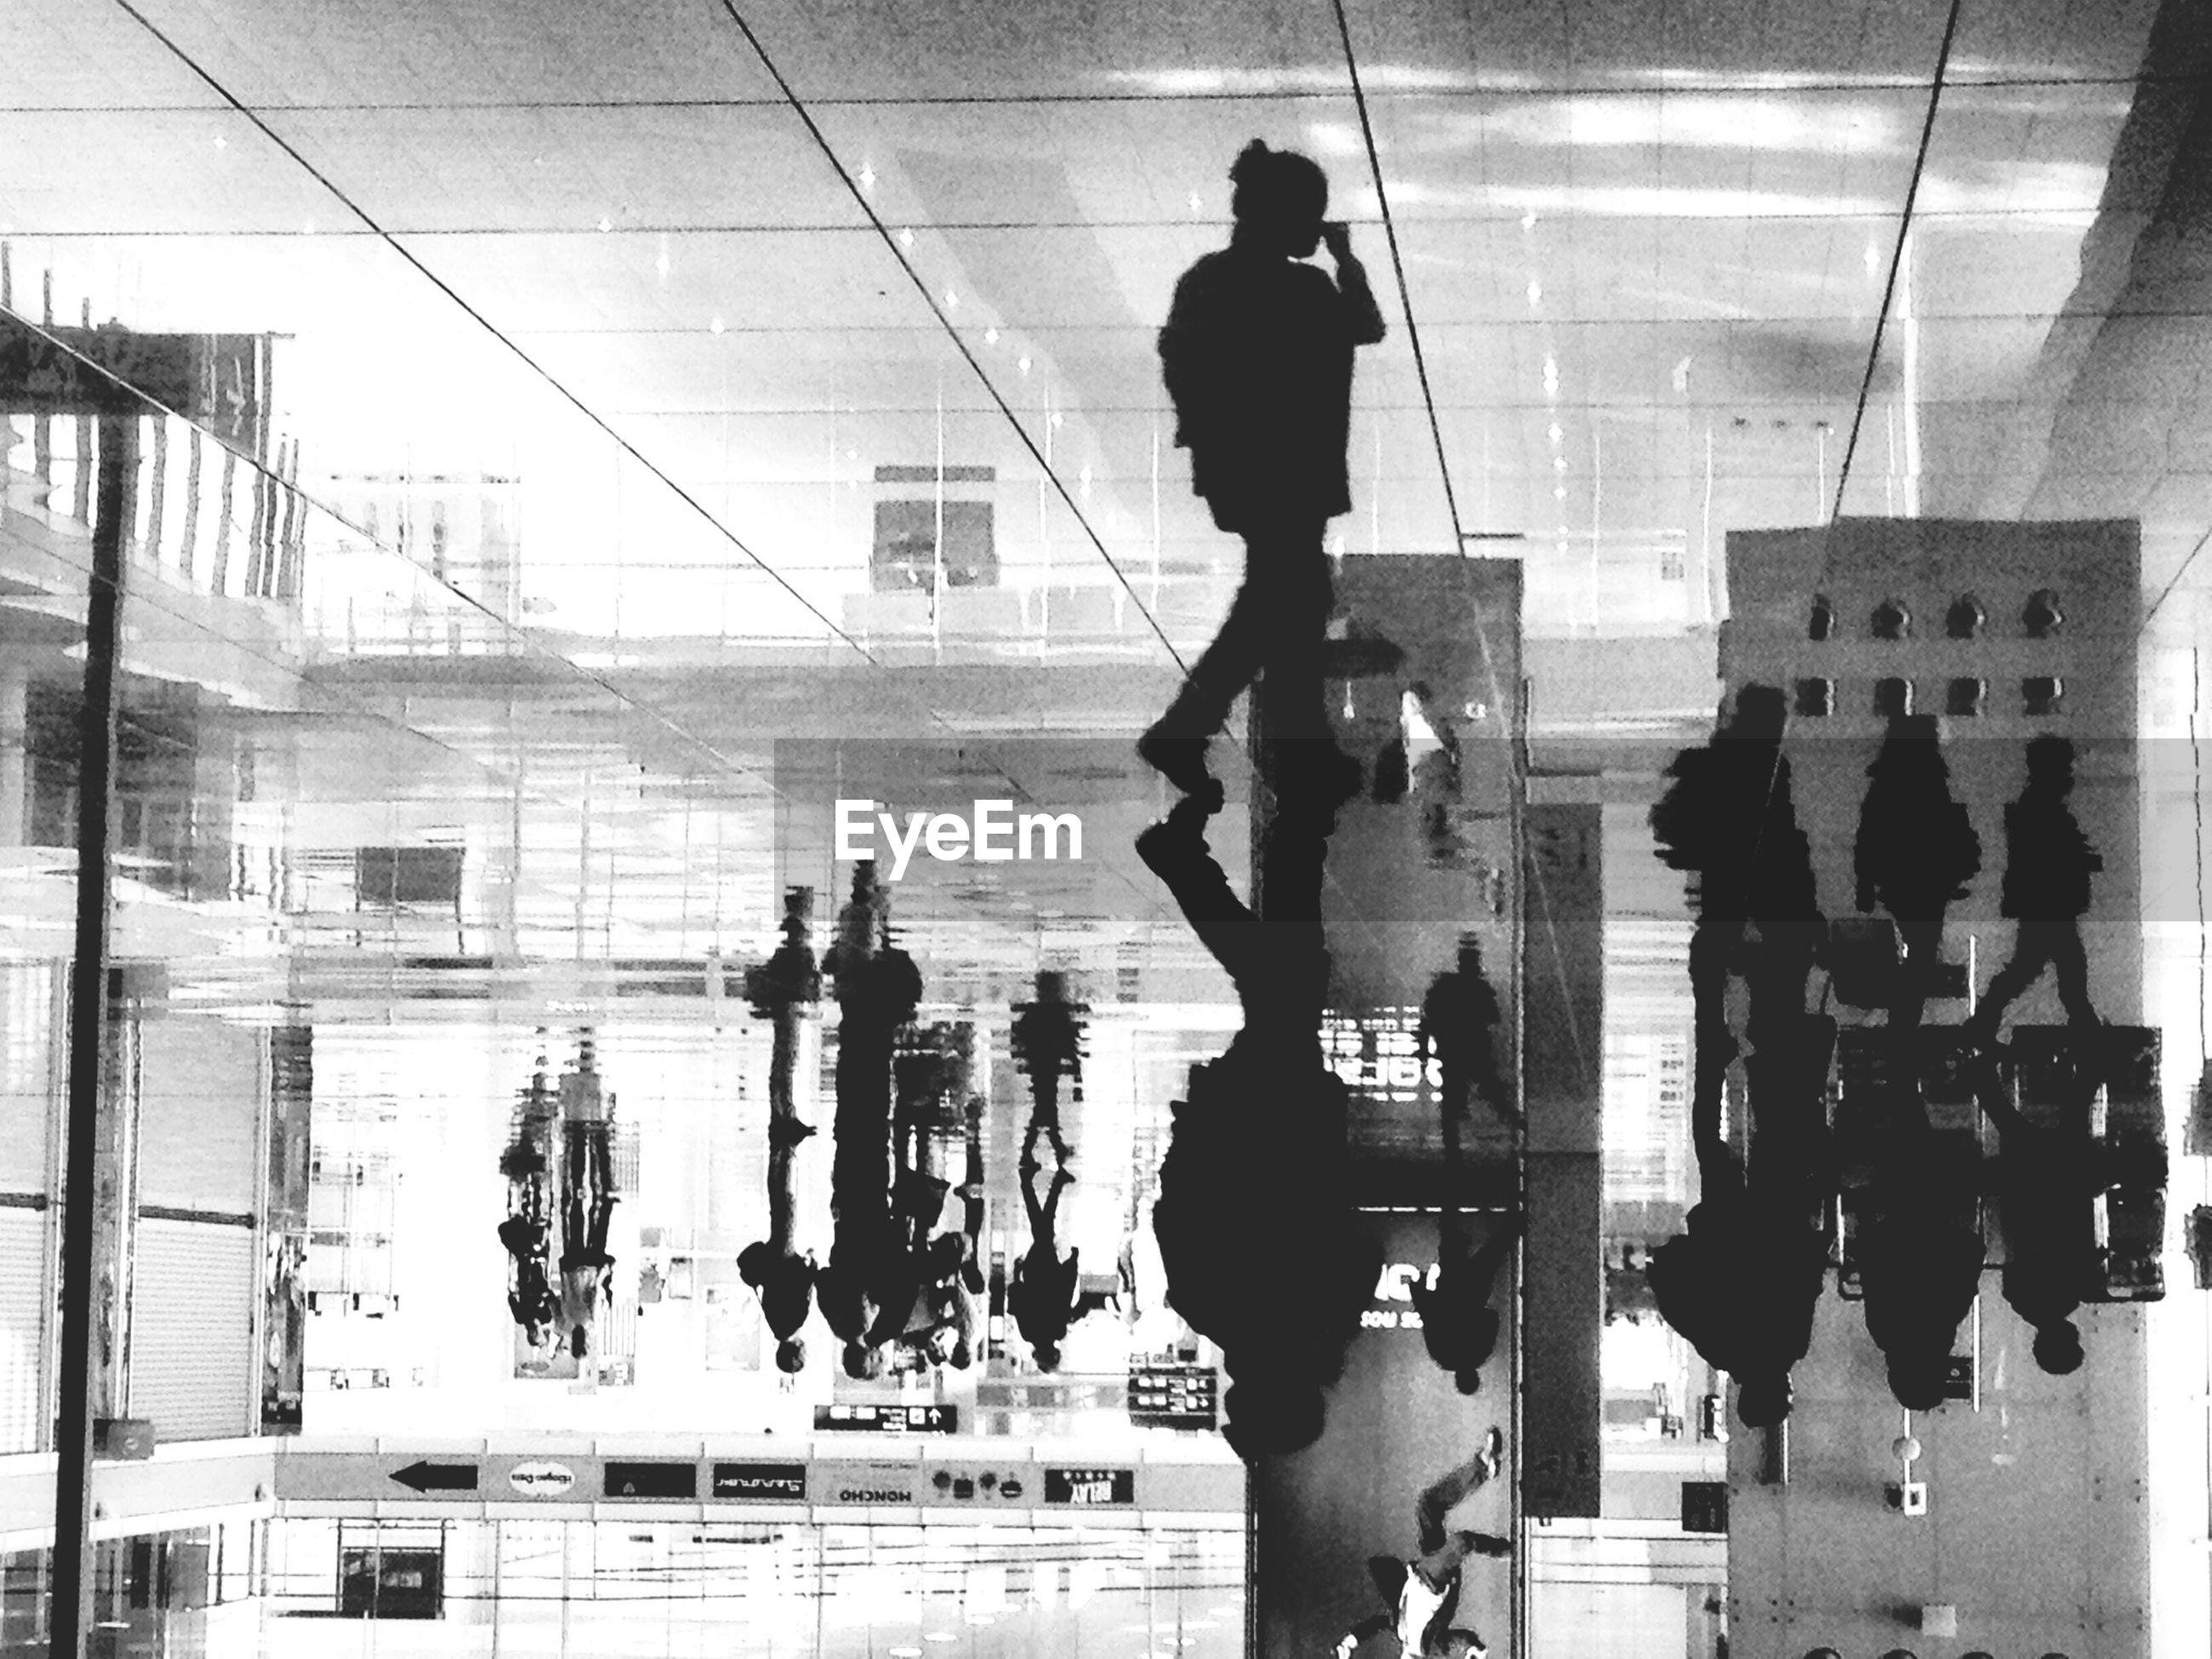 Upside down image of silhouette people on wet tiled floor